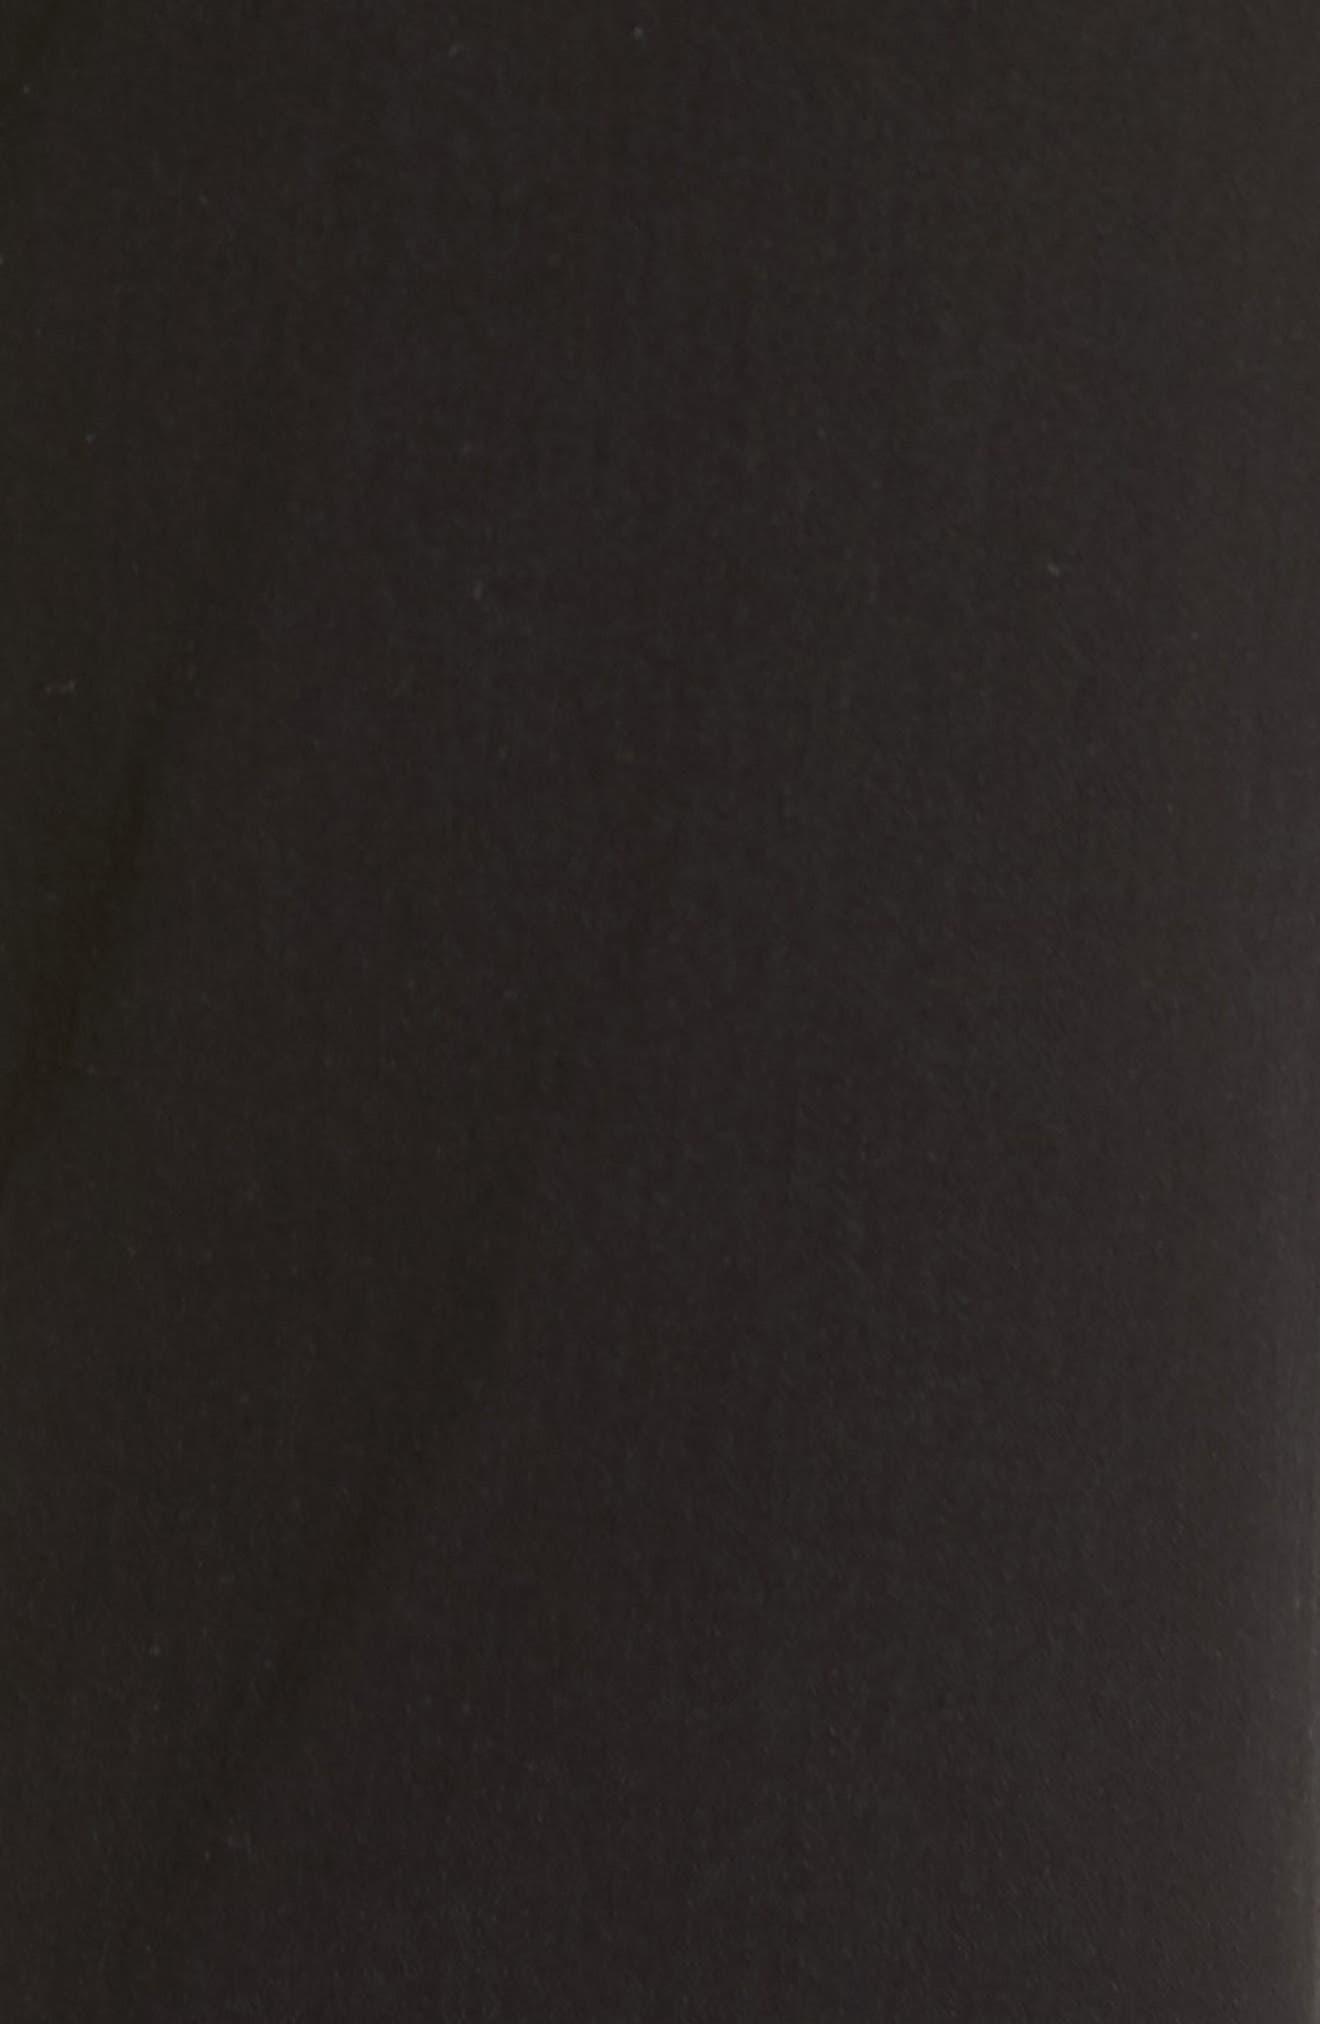 Sheri Stretch Skinny Jeans,                             Alternate thumbnail 5, color,                             001